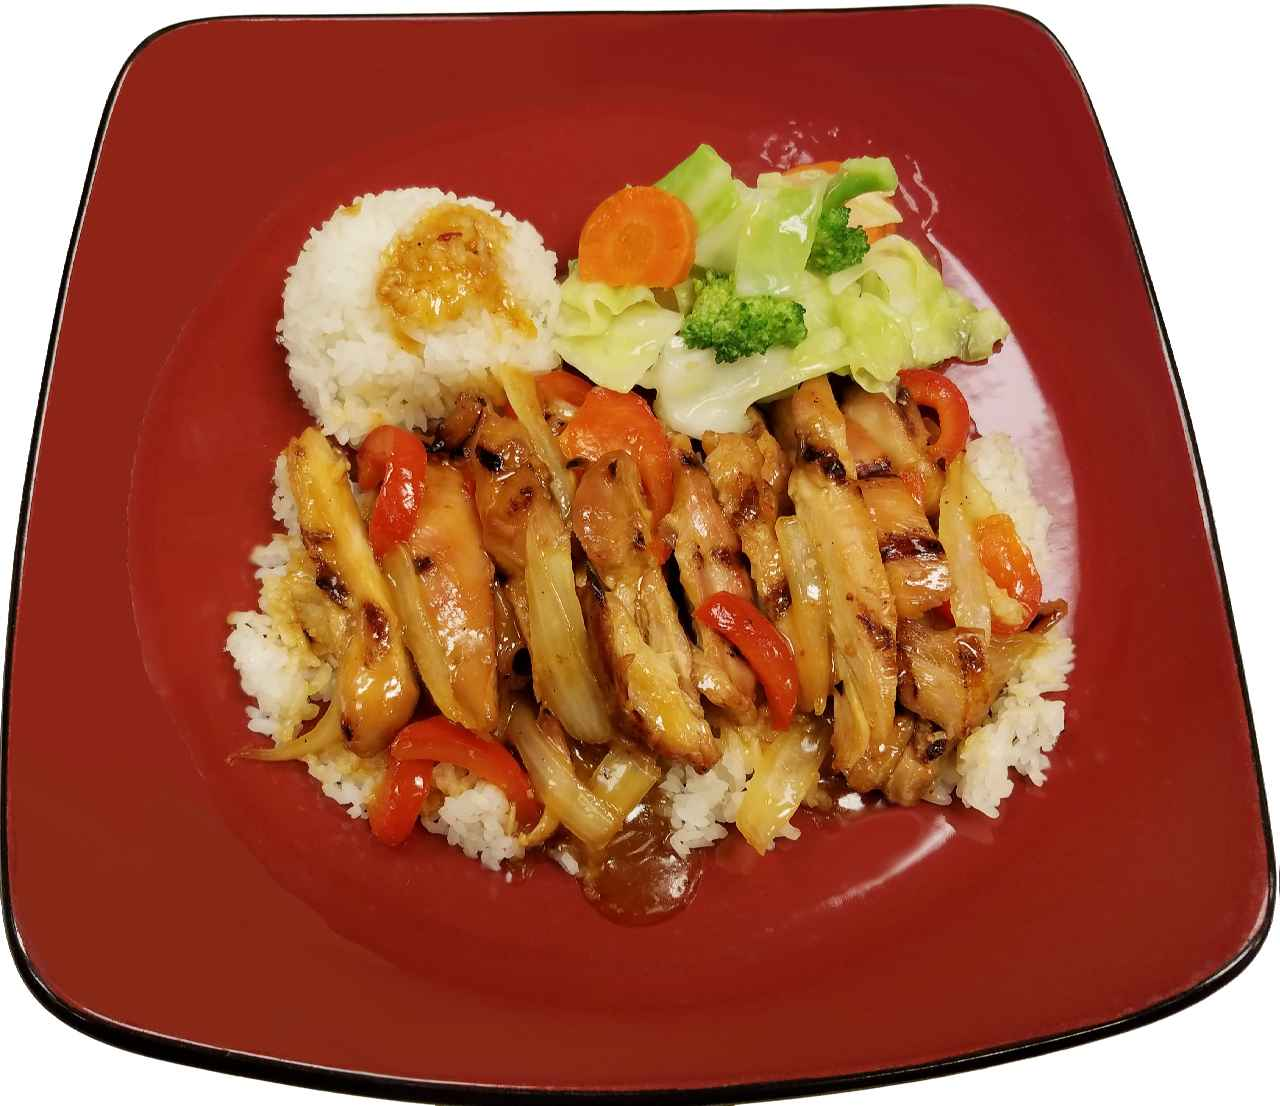 16. Spicy Orange Chef Special